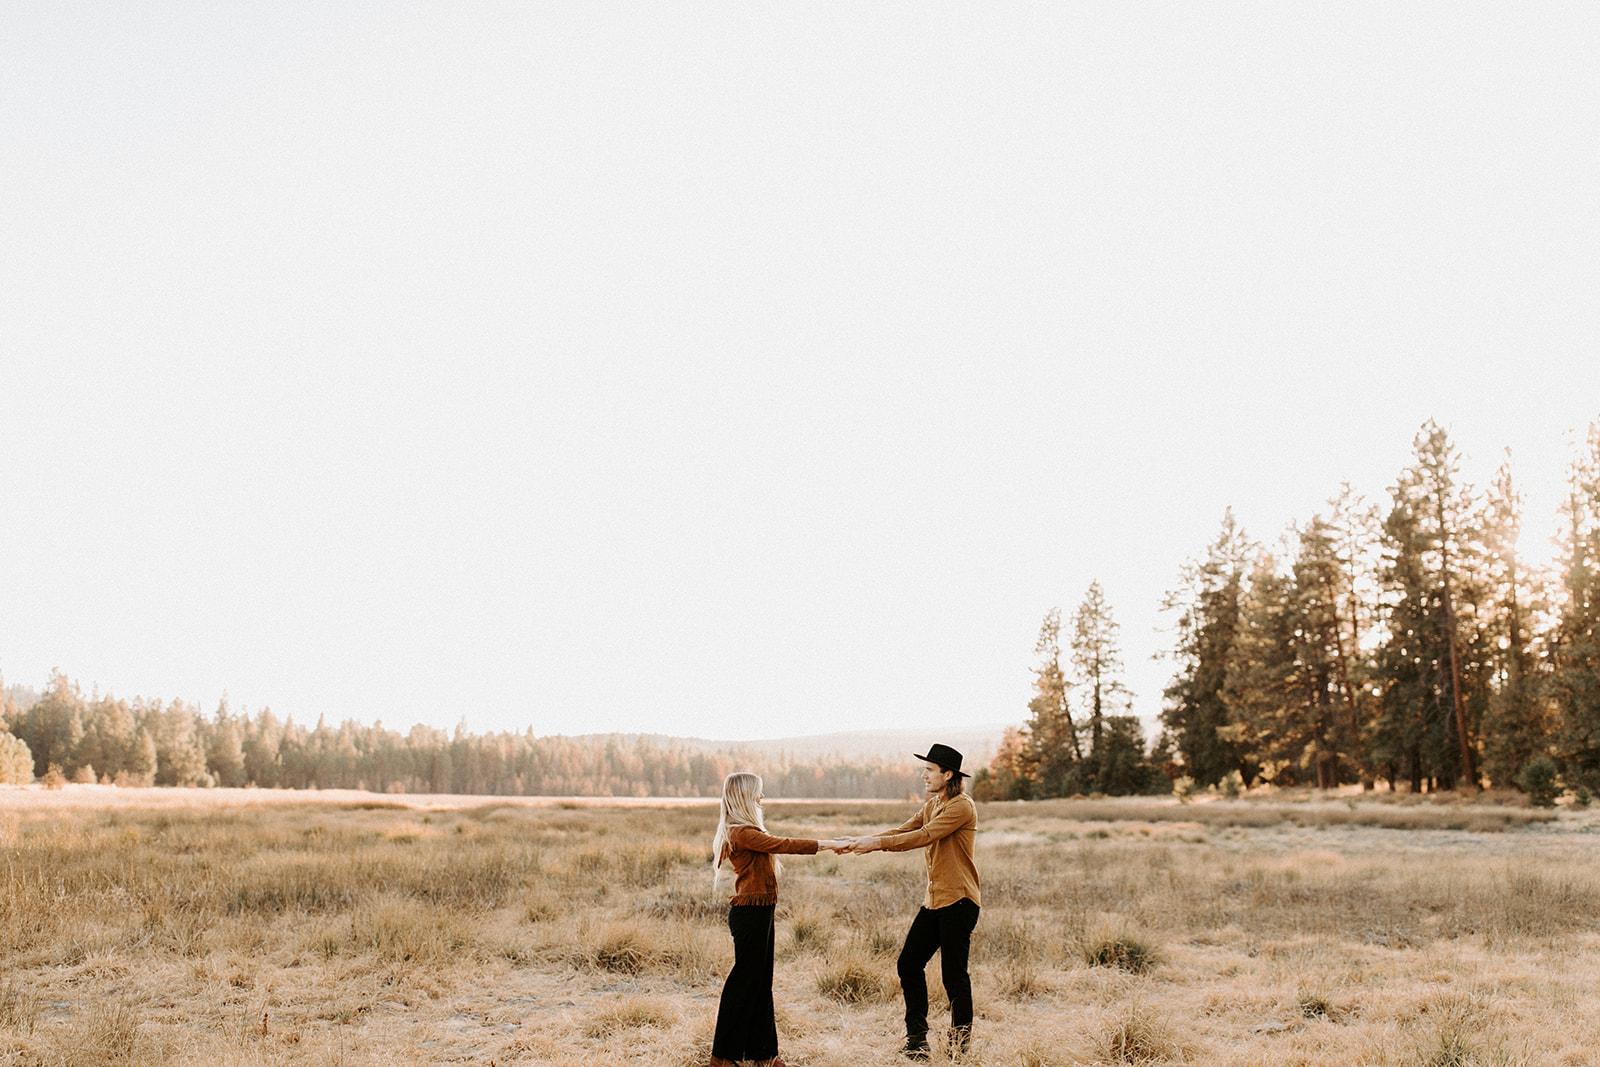 BendOregonCouplesSessionCharlotteandJamesDawnCharlesPhotographer-39.jpg